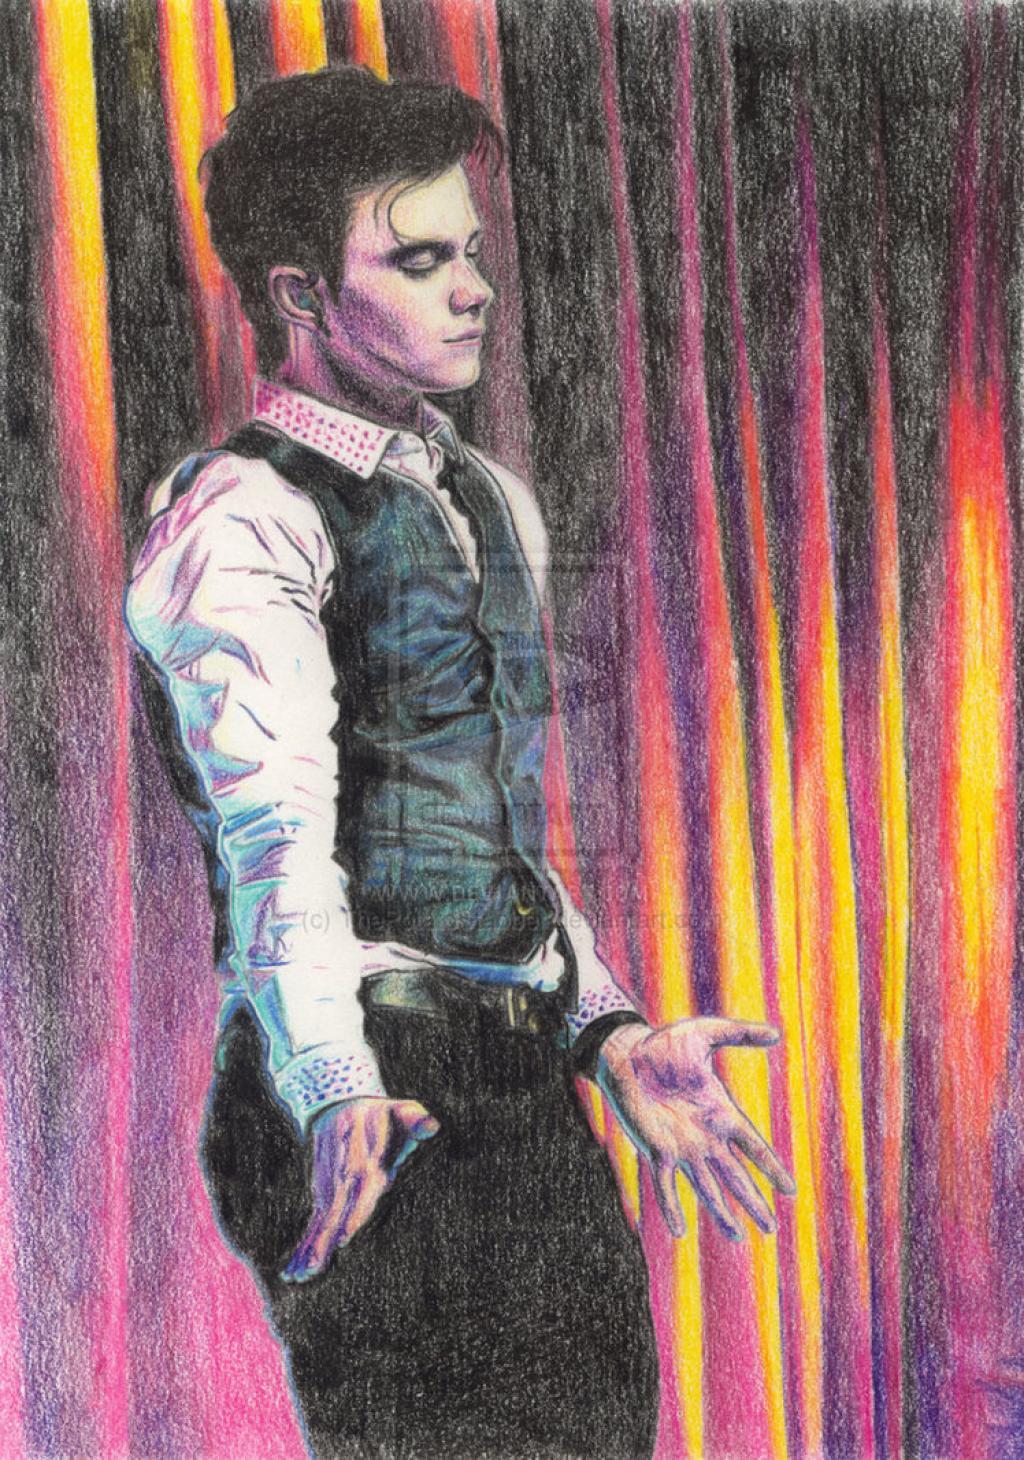 Chris Drawings & paintings Fanarts Chris_colfer___gl...-d49eg7o-31f6129